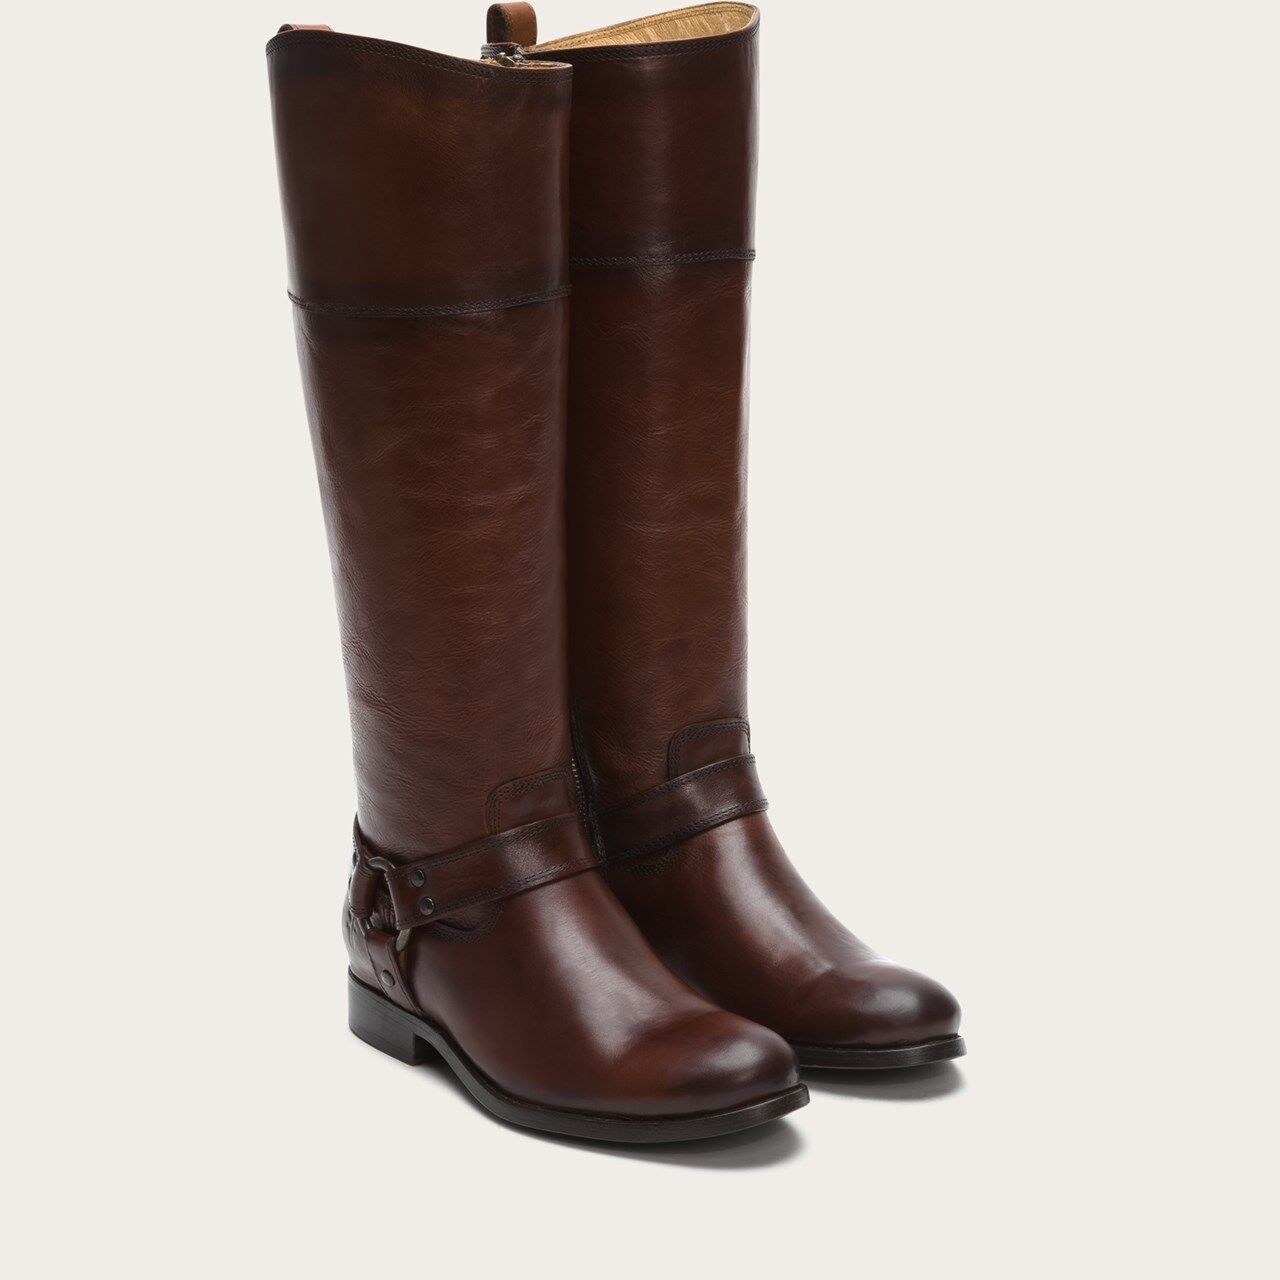 NIB Frye Melissa Melissa Melissa Harness Riding Boots 3476927 Zipper ExtCalf Redwood Womens Sz 7 99d611